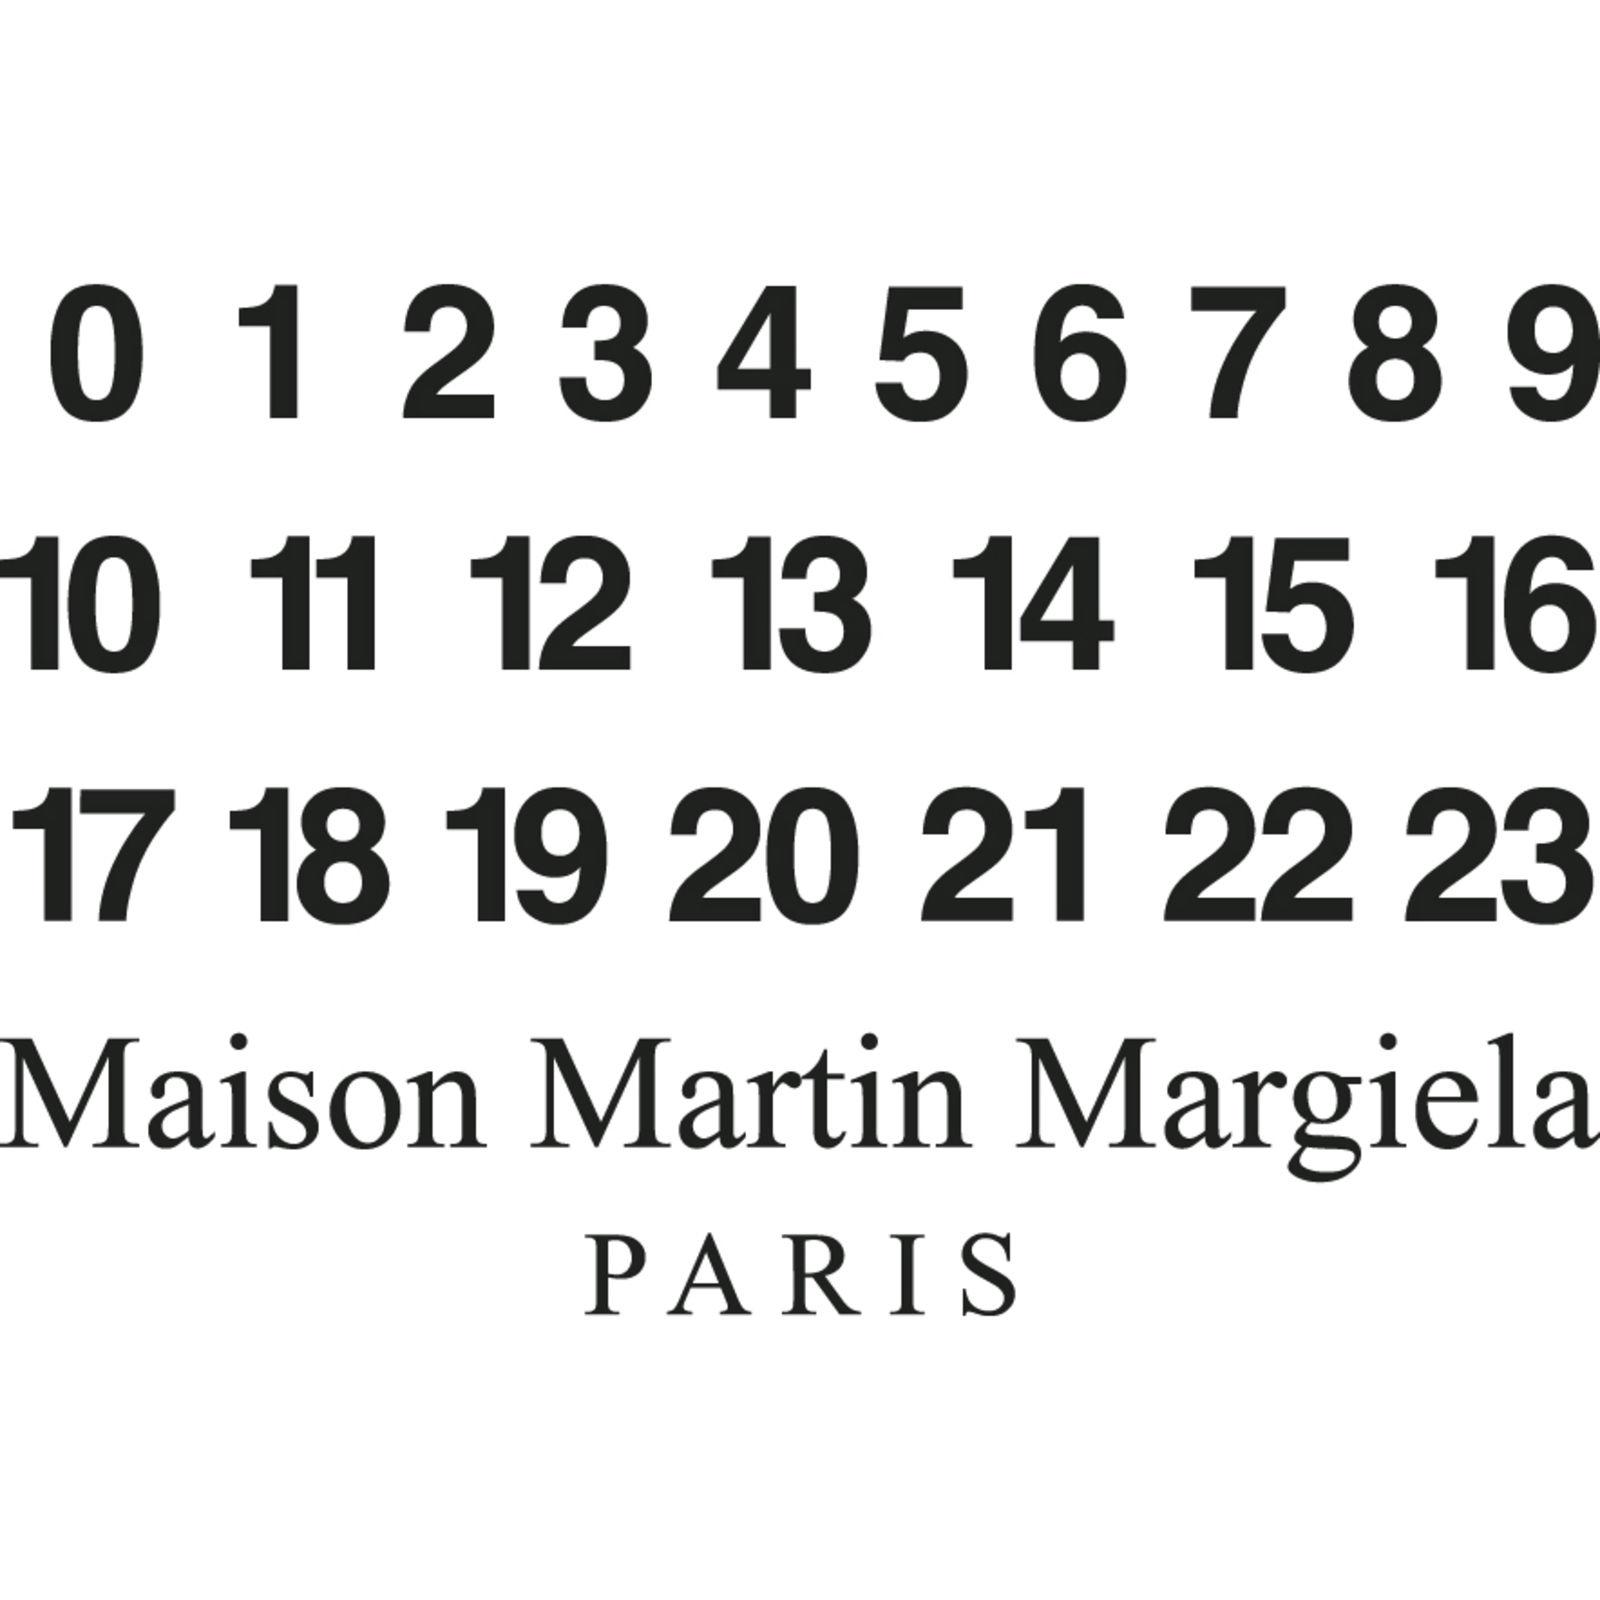 Maison Margiela Homme (Bild 1)